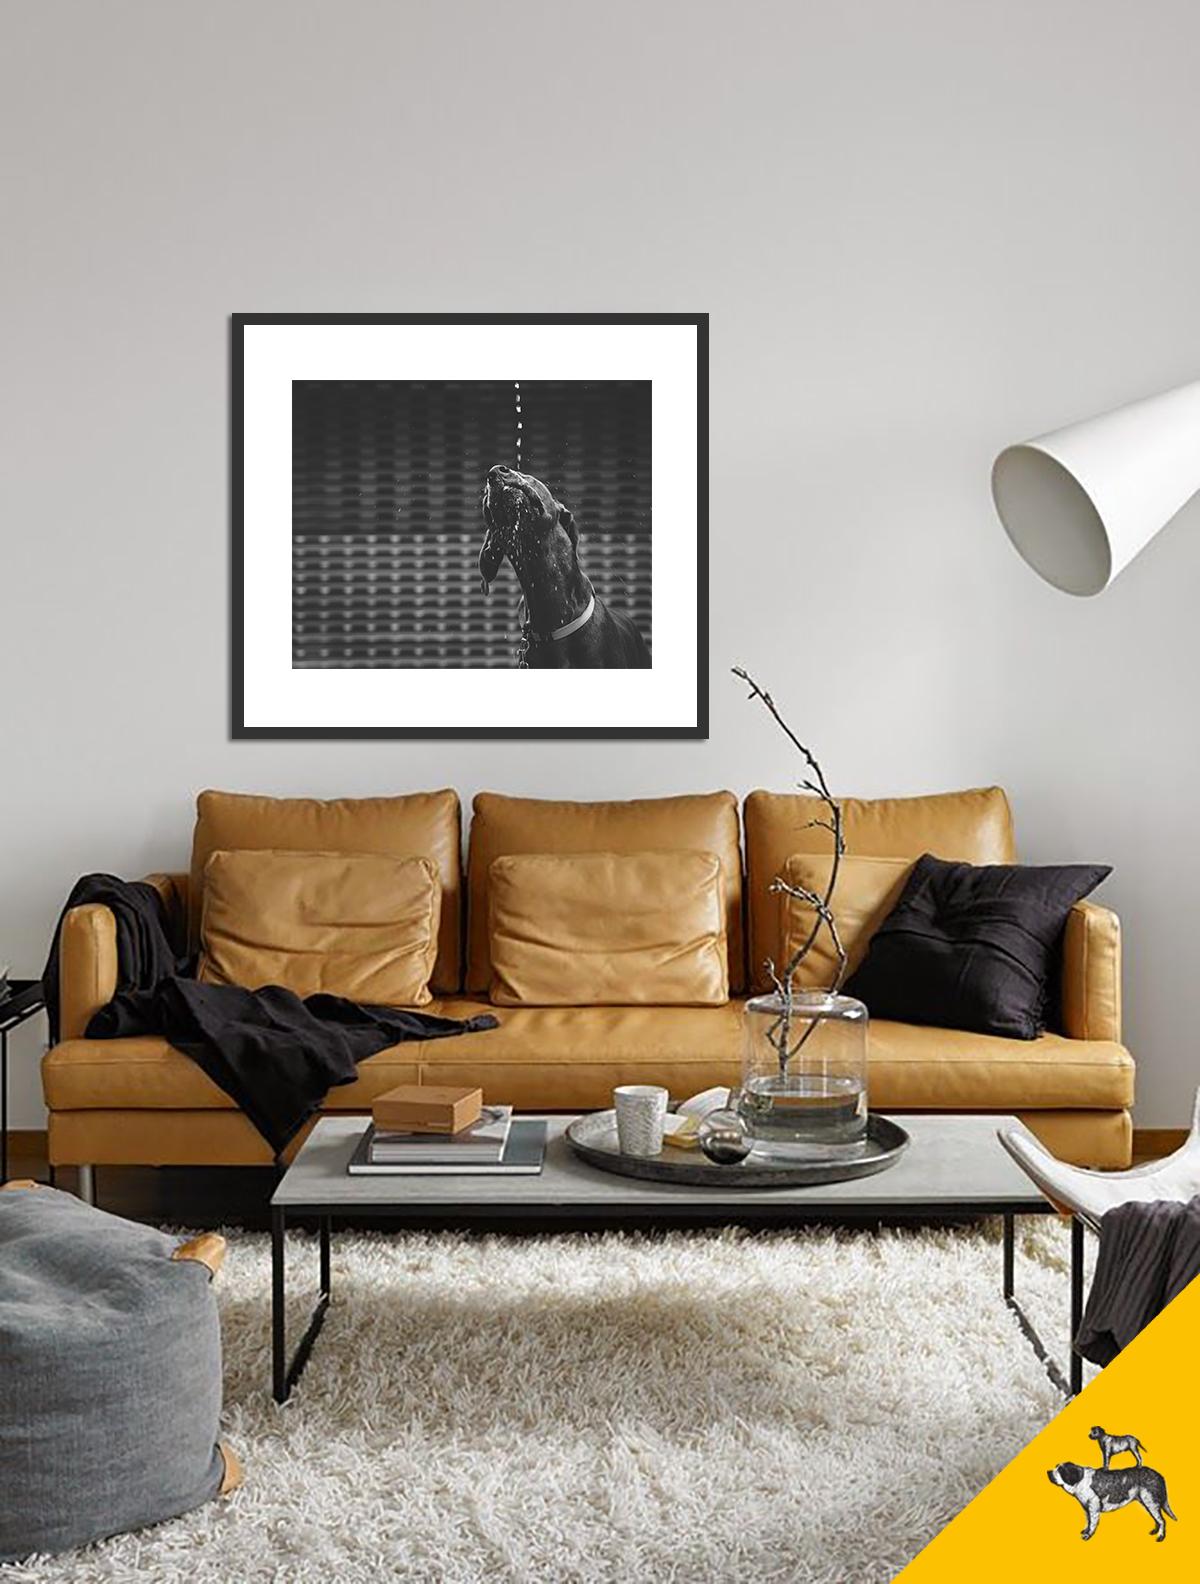 Single canvas/frame ($990+)